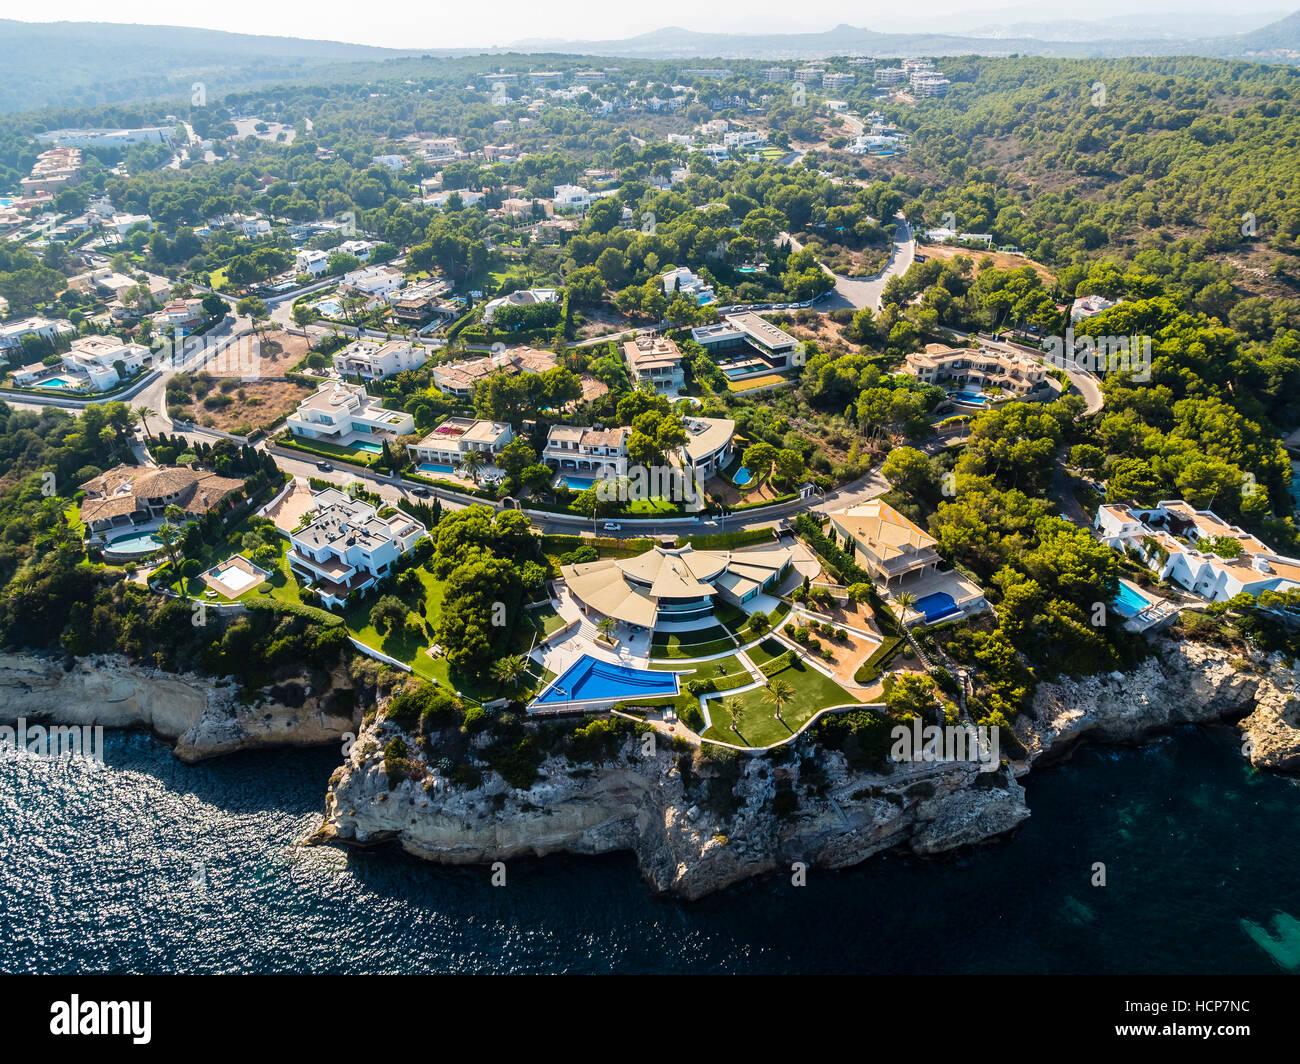 Aerial view, villas at Portals Vells, El Toro, Mallorca, Balearic Islands, Spain - Stock Image